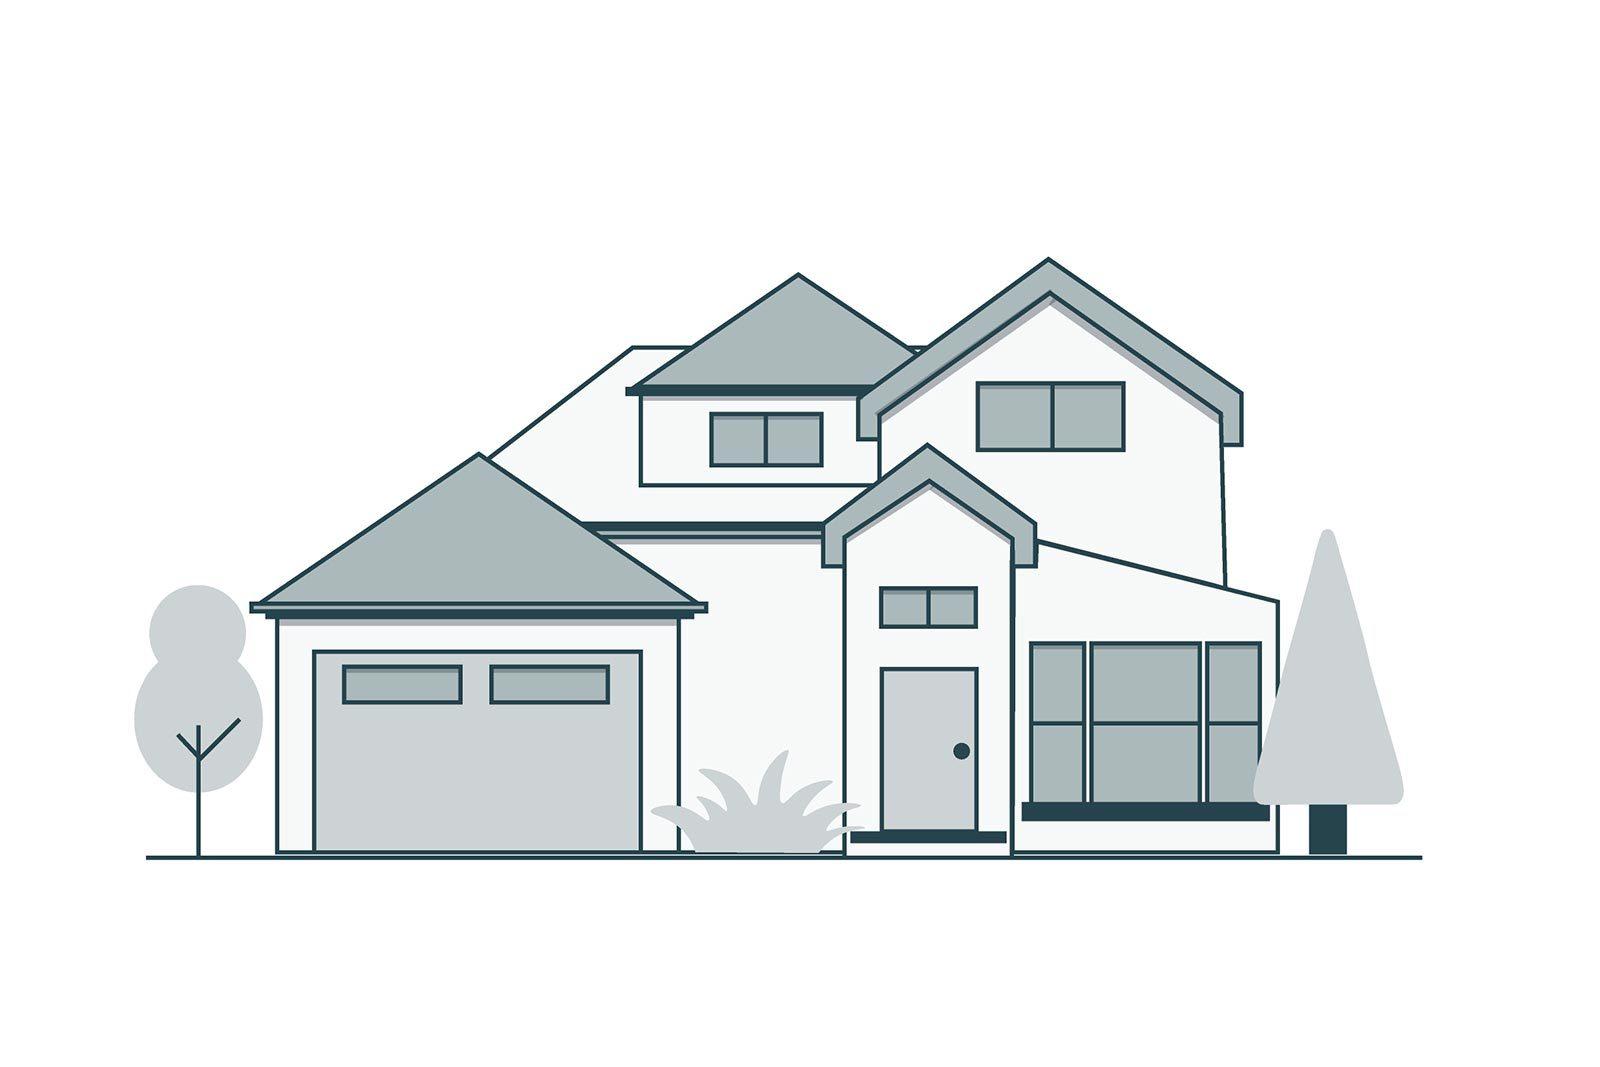 251 Glenview Dr San Francisco, CA 94131